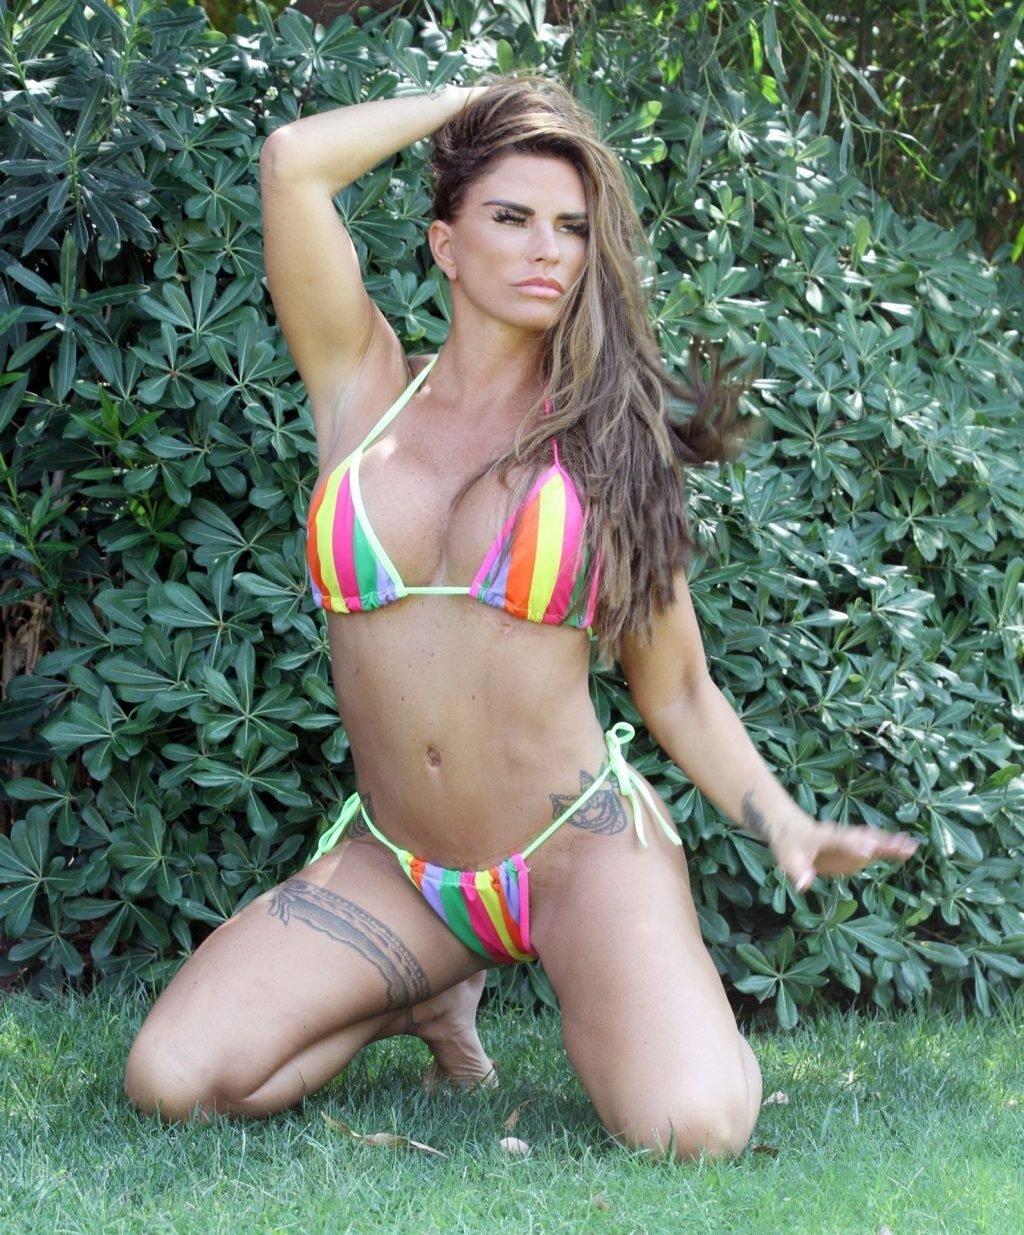 Katie-Price-Nude-Sexy-TheFappeningBlog.com-71-1024x1235.jpg